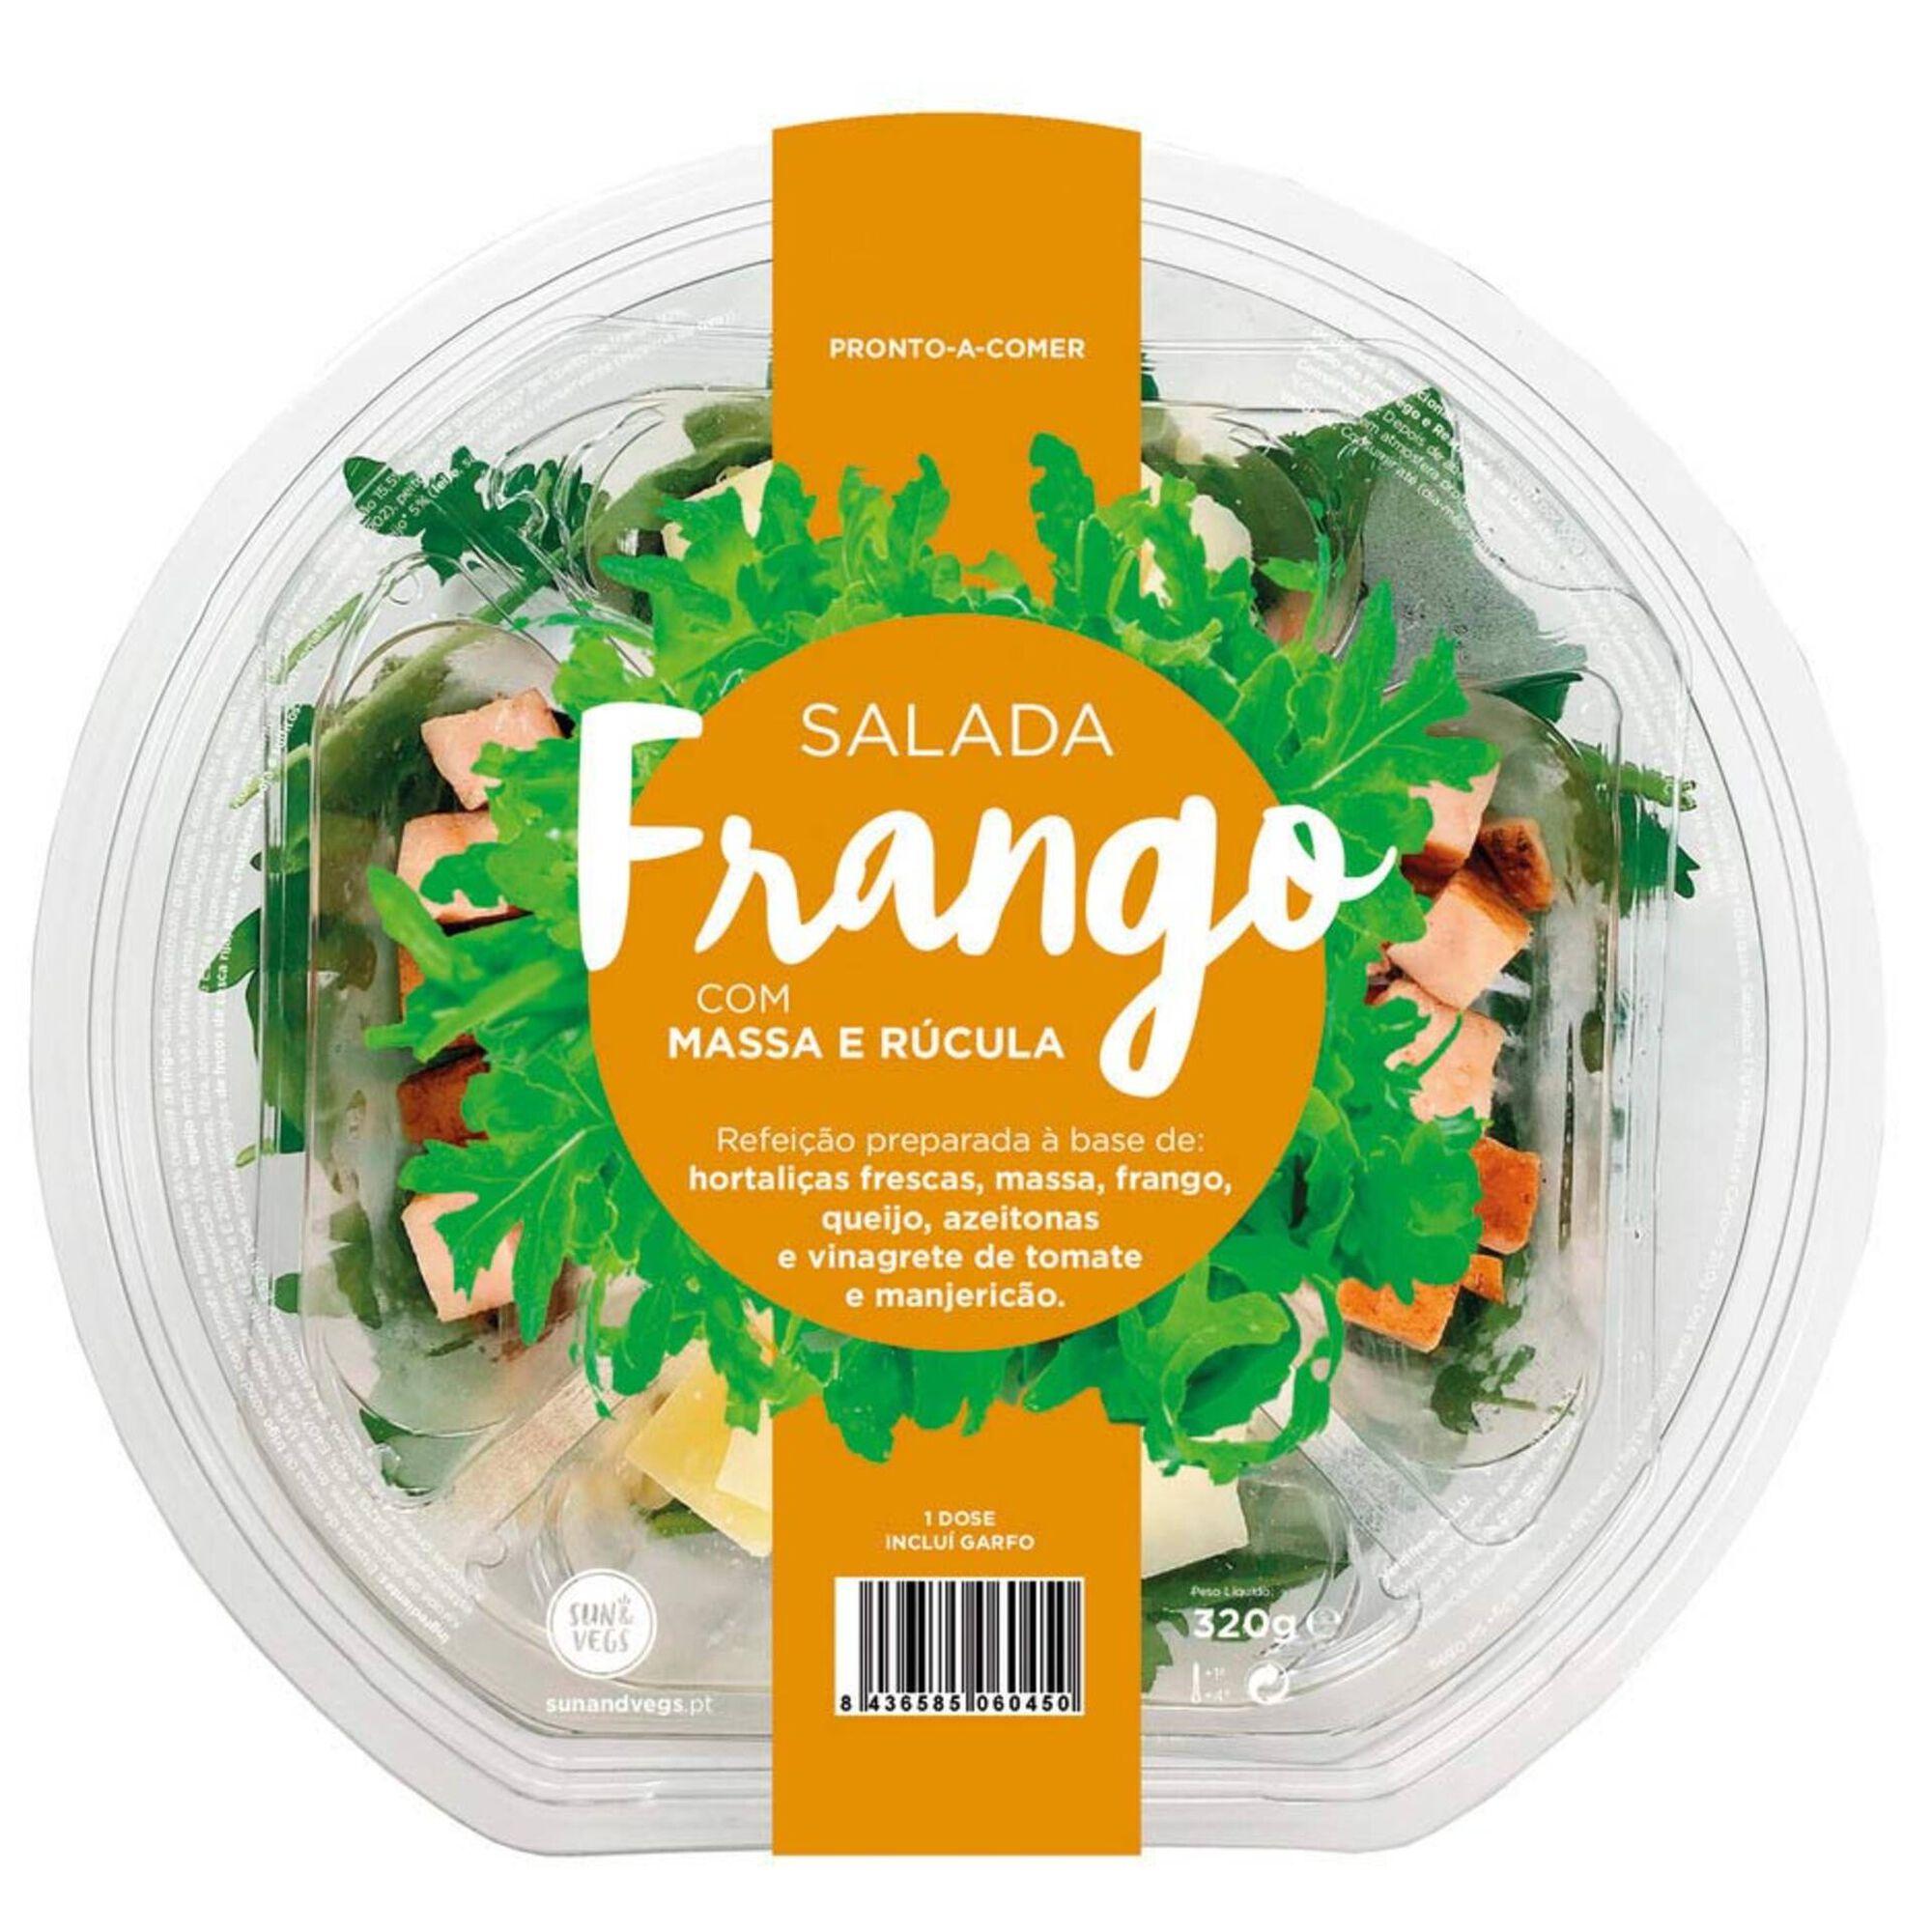 Salada de Frango com Massa e Rúcula